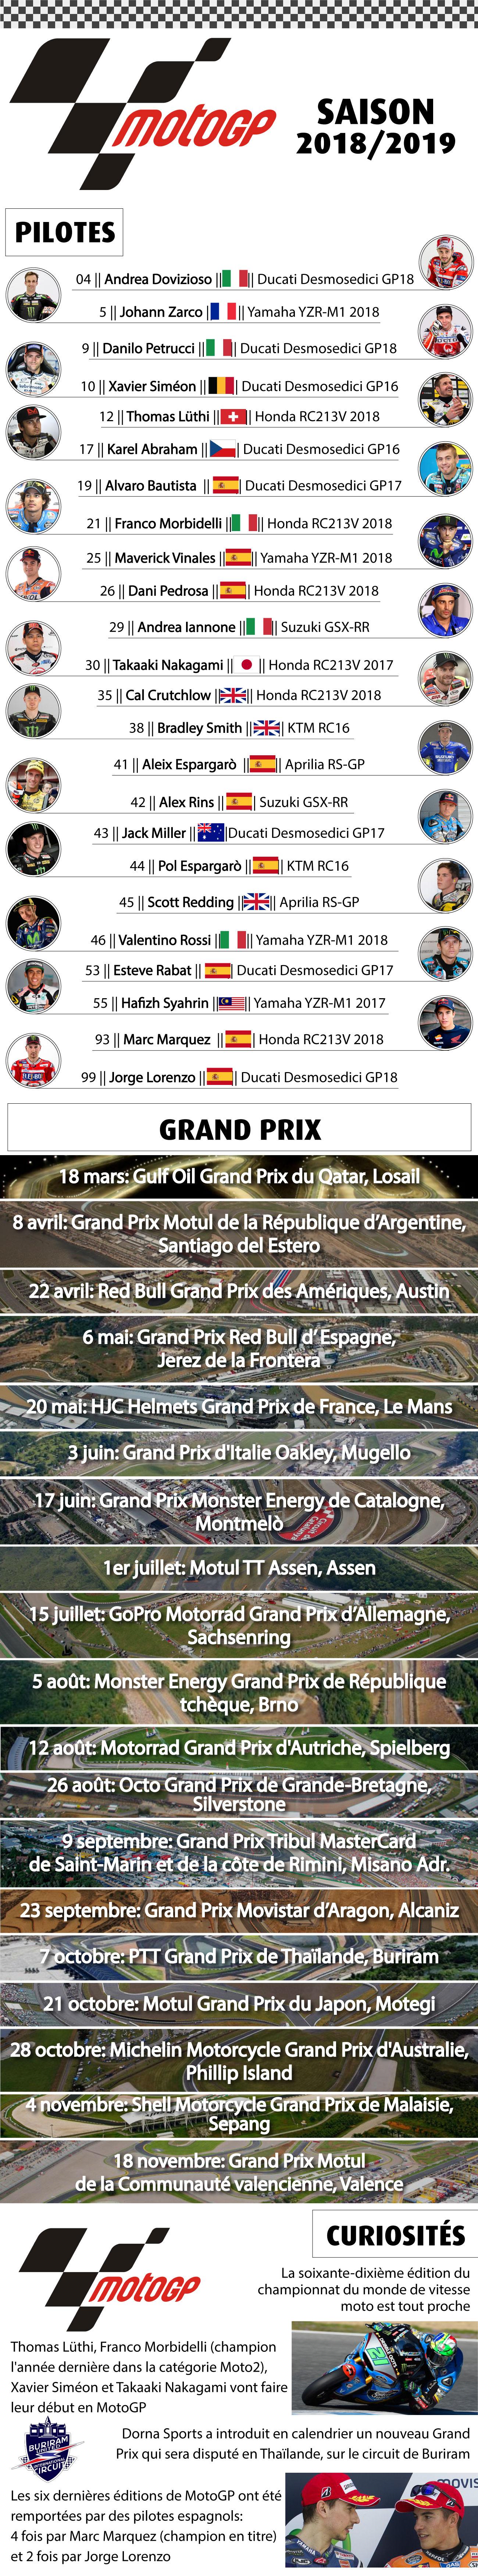 MotoGP 2018 calendrier